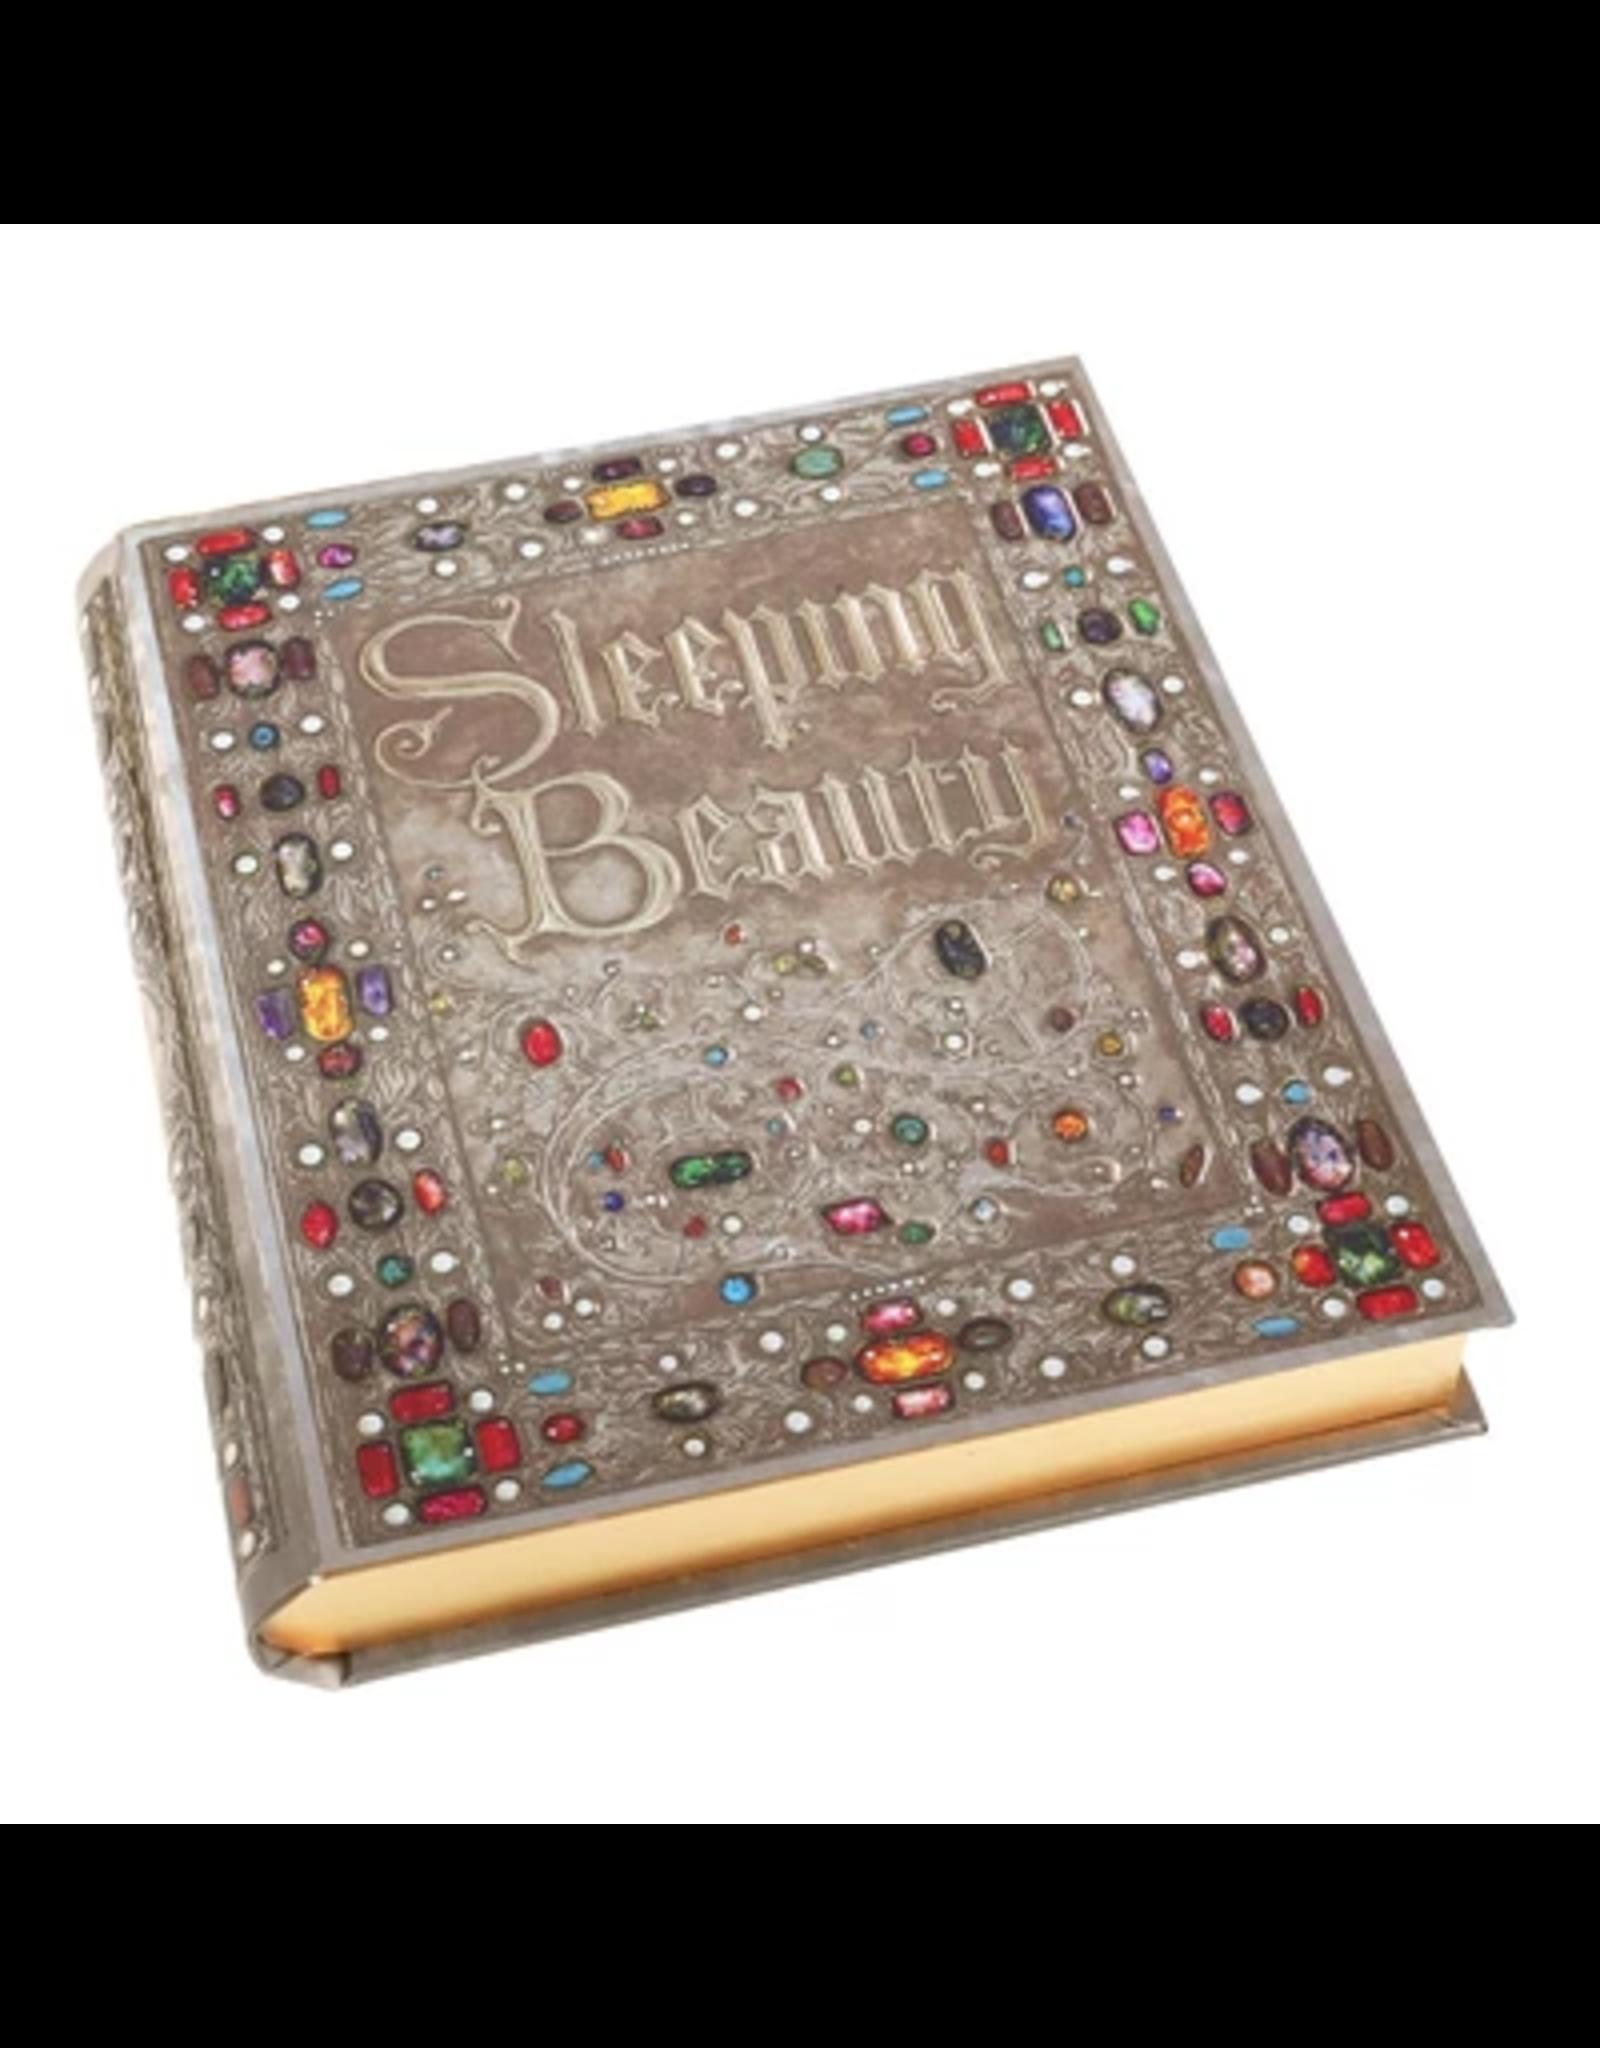 BESAME 1959 - Sleeping Beauty Eye Shadow Palette